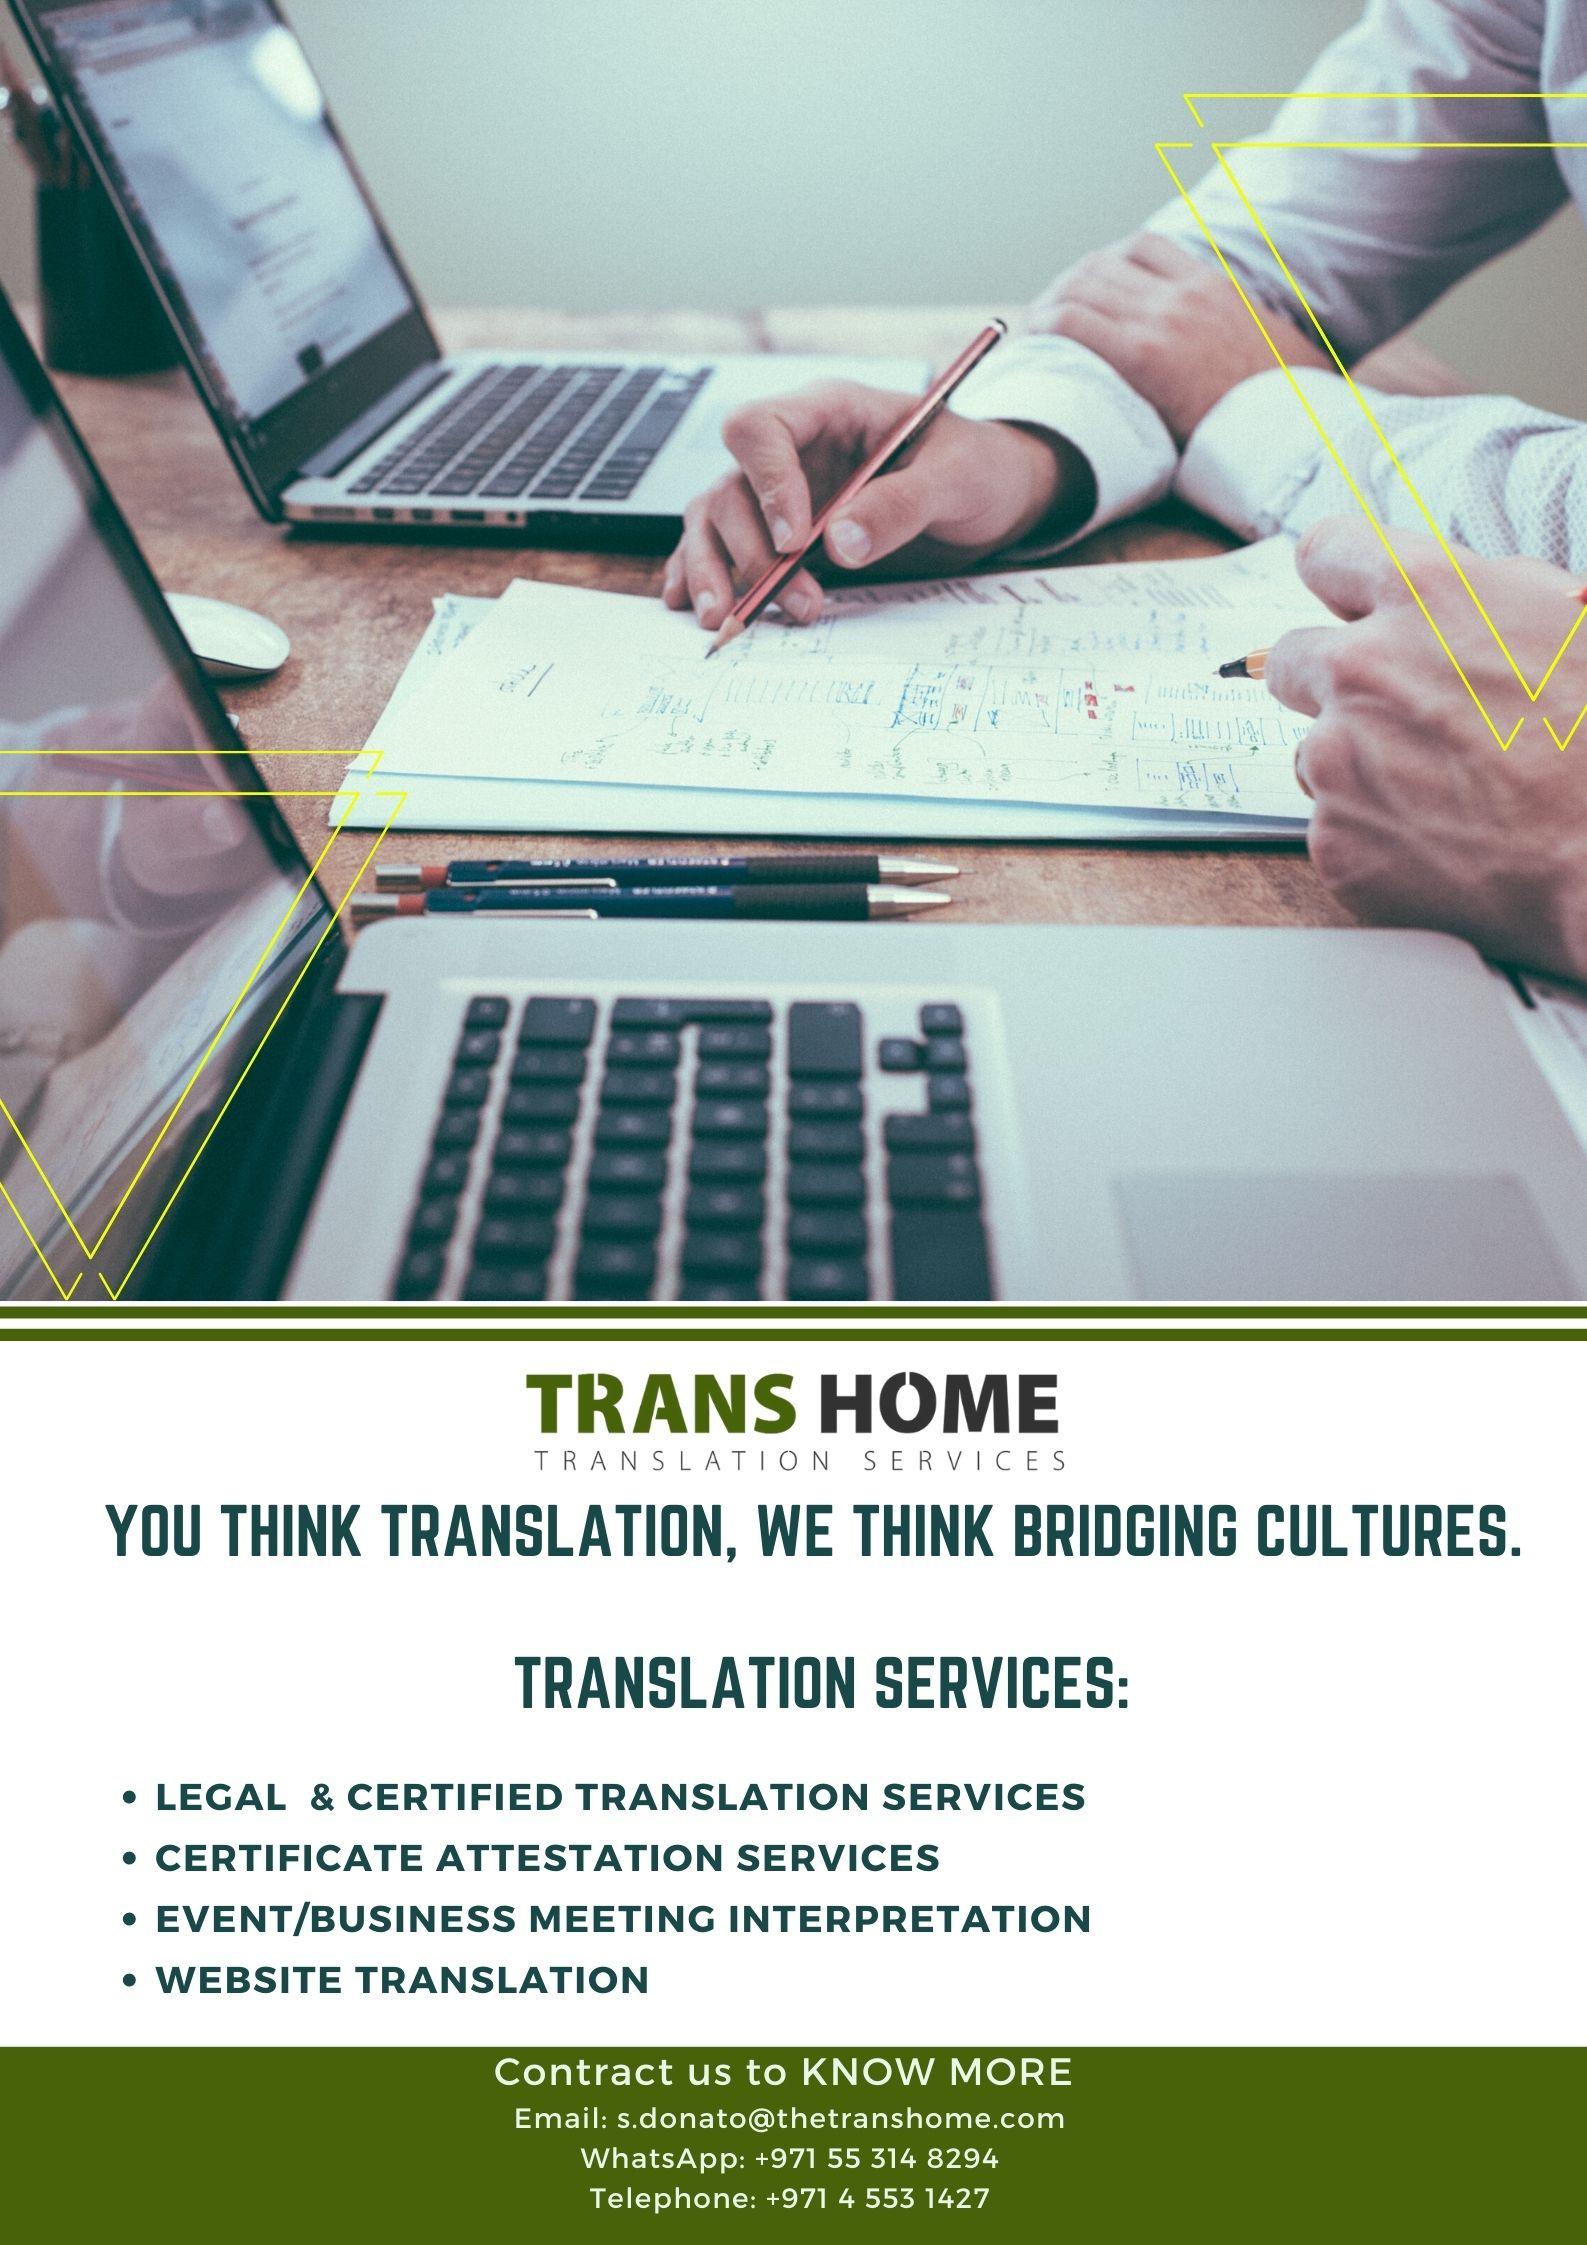 Transhome